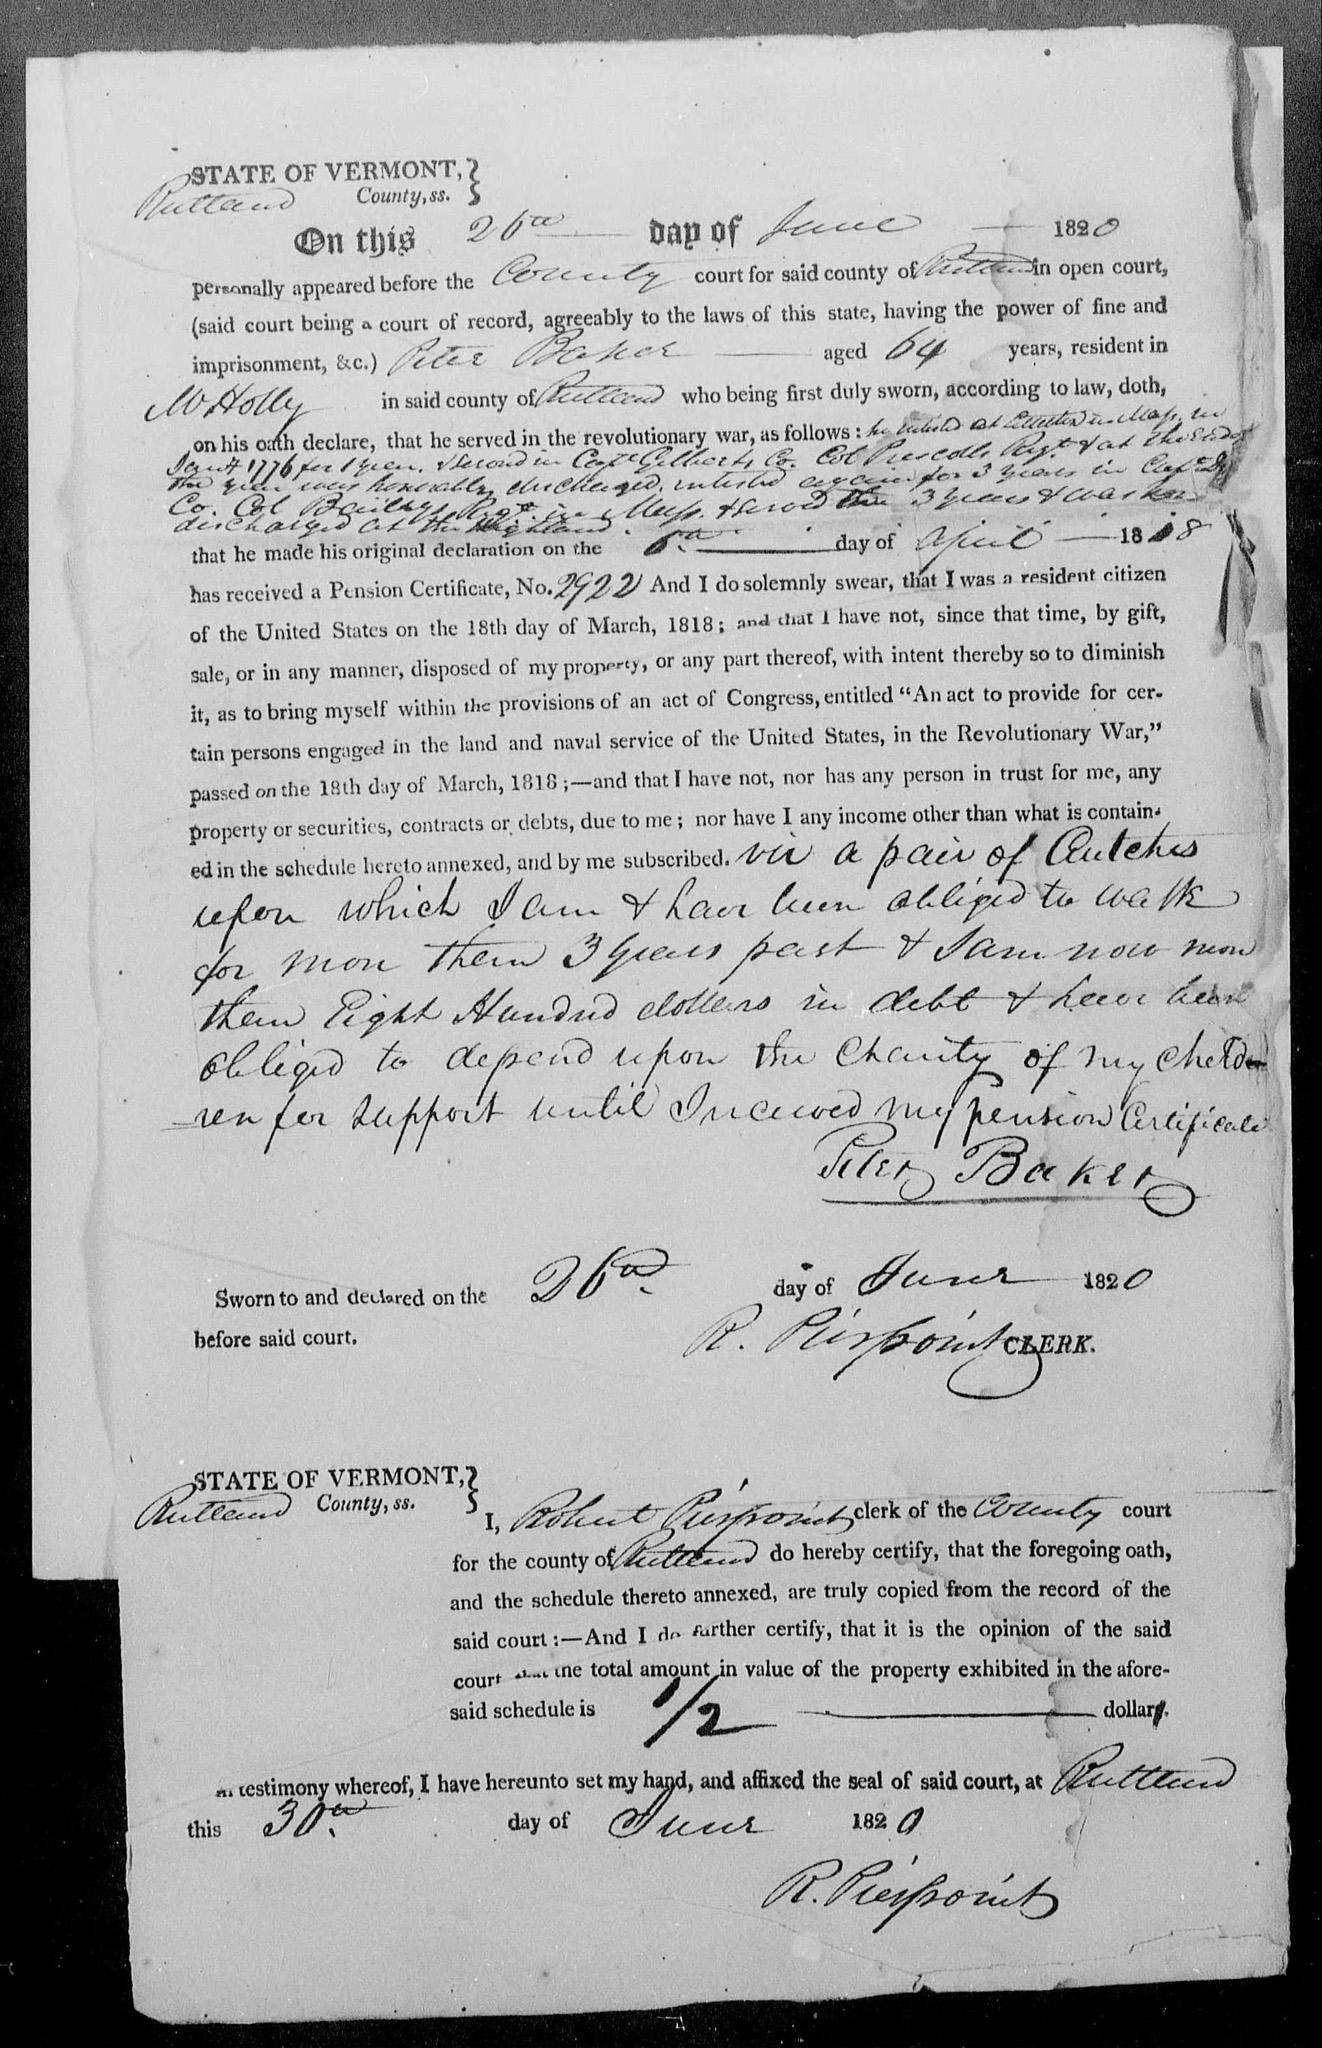 Peter Baker Rev War Pension File, pg 8